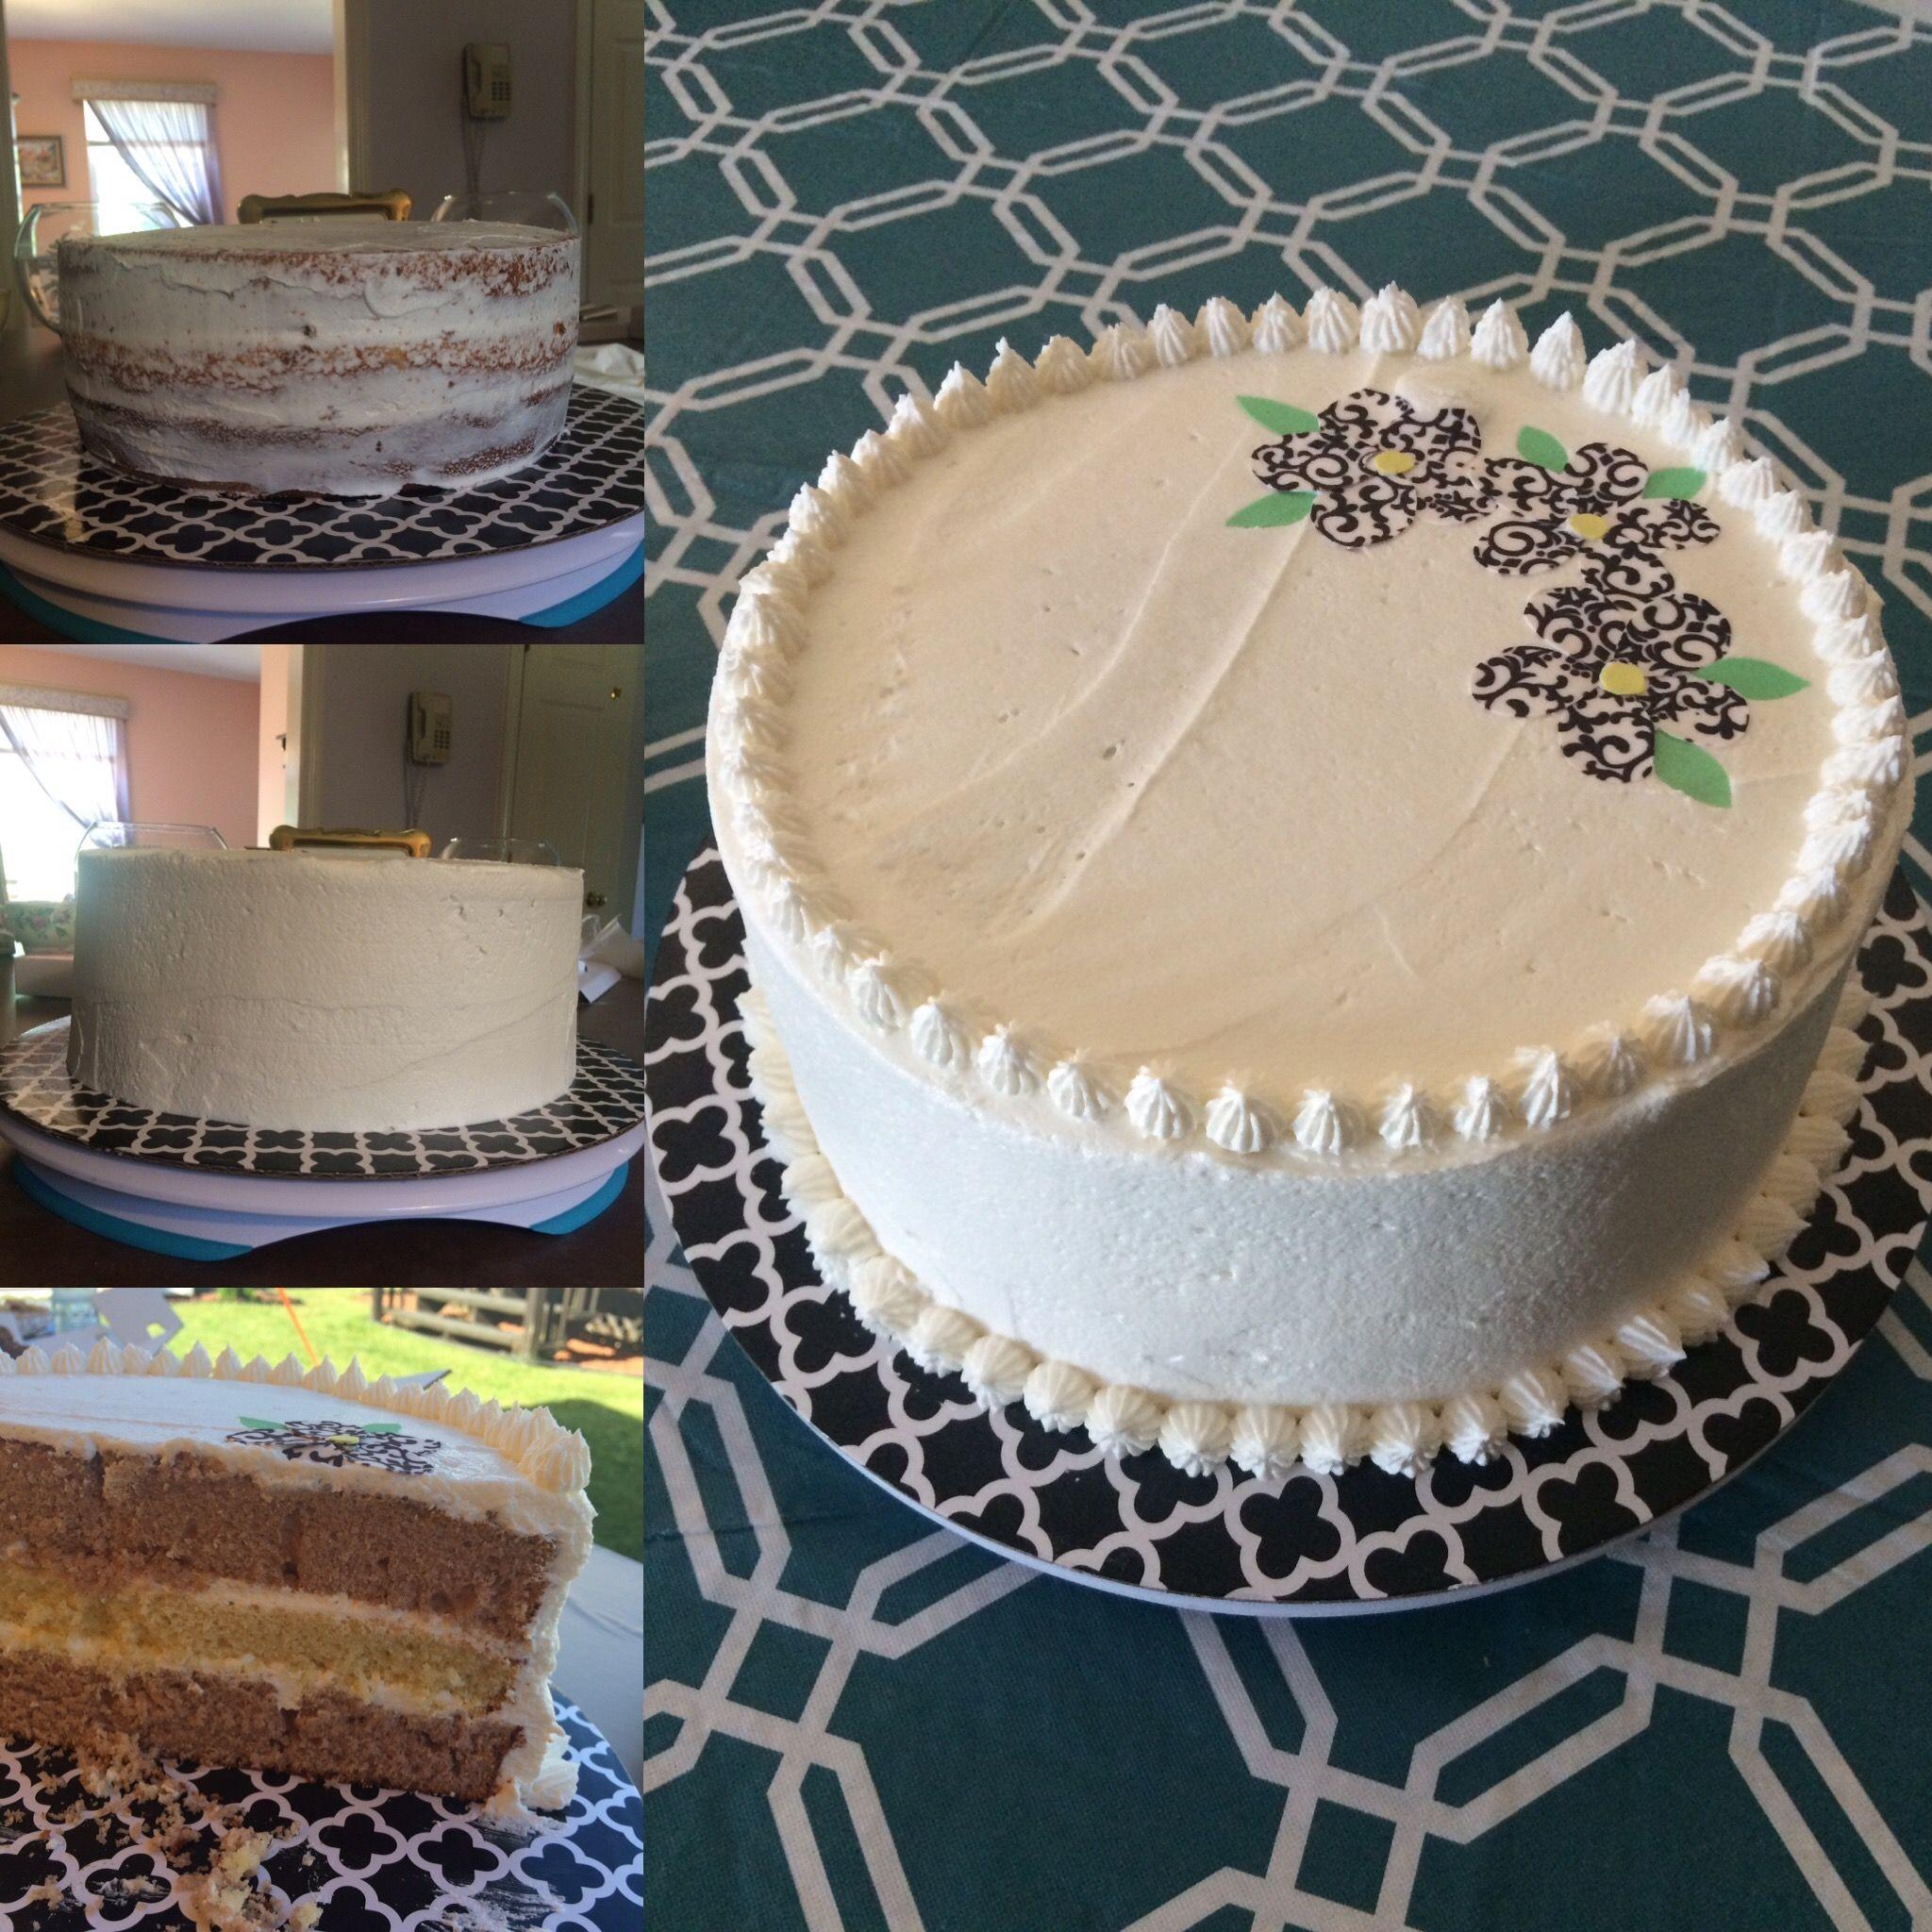 Vanilla cake layer: http://www.rachaelrayshow.com/recipe/14376_The_Cake_Boss_Vanilla_Cake/  Strawberry cake layers: http://www.mycakeschool.com/recipes/strawberry-scratch-recipe/  Buttercream frosting: http://www.craftymorning.com/best-buttercream-frosting-recipe/